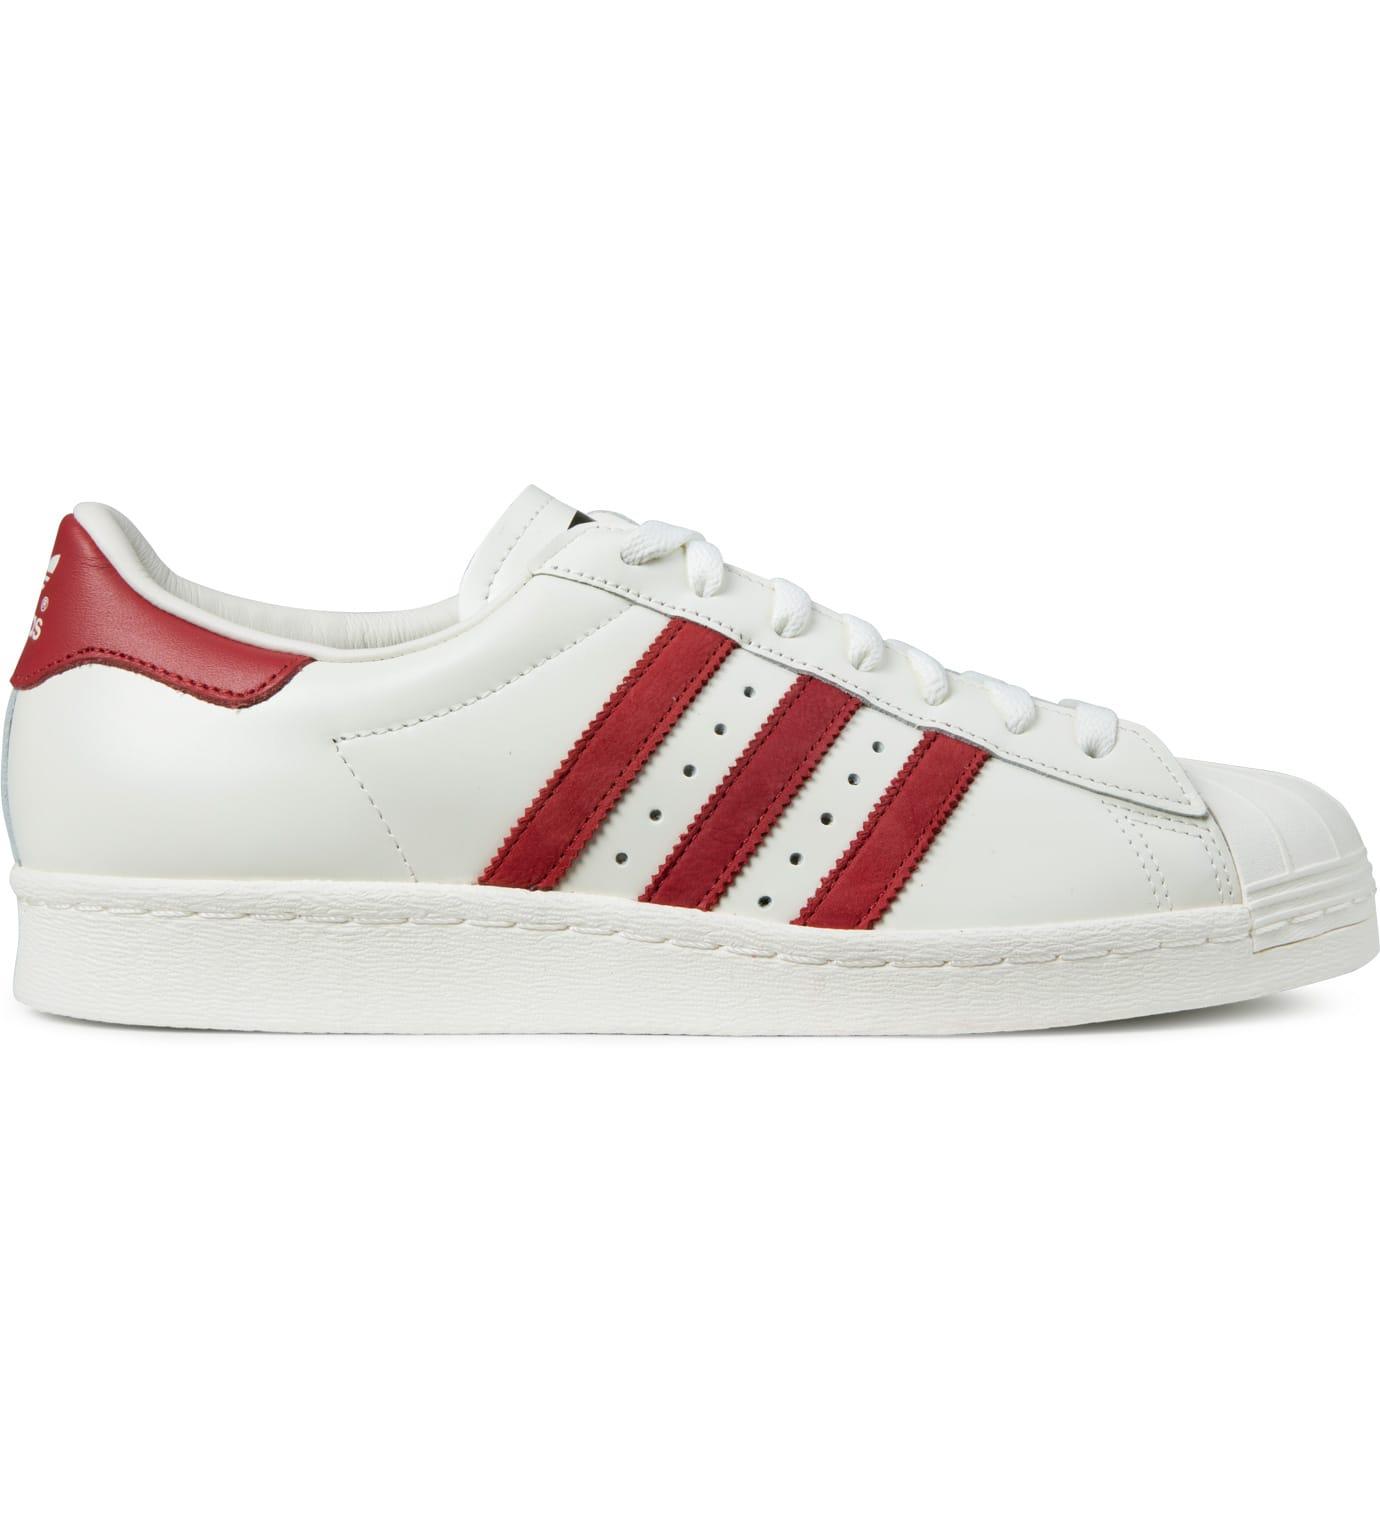 Adidas Originals Vintage White Red Superstar 80s Dlx B35982 Shoes